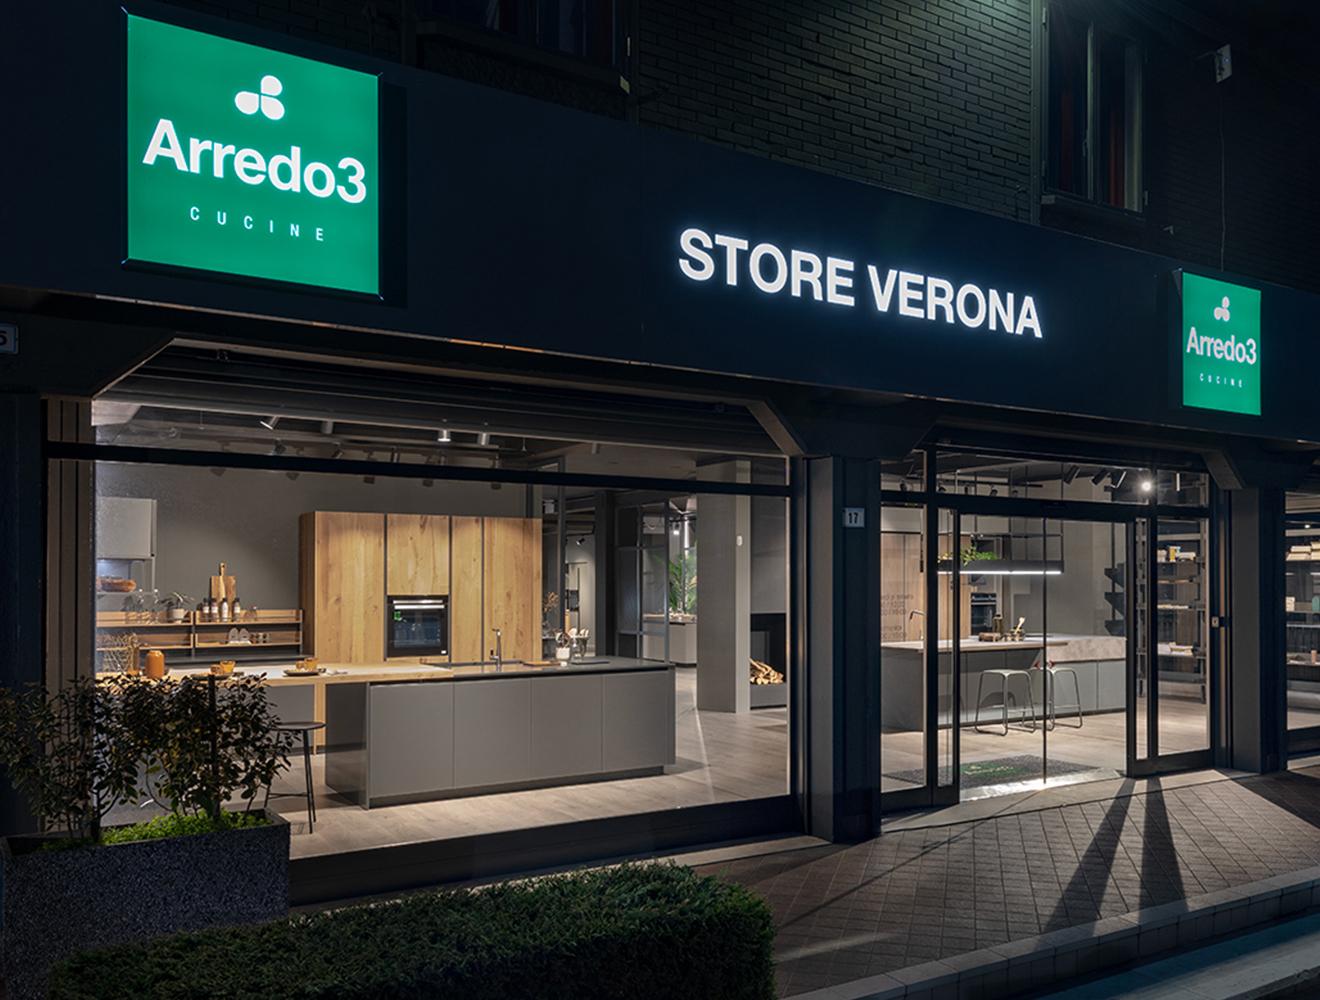 arredo3_verona_00